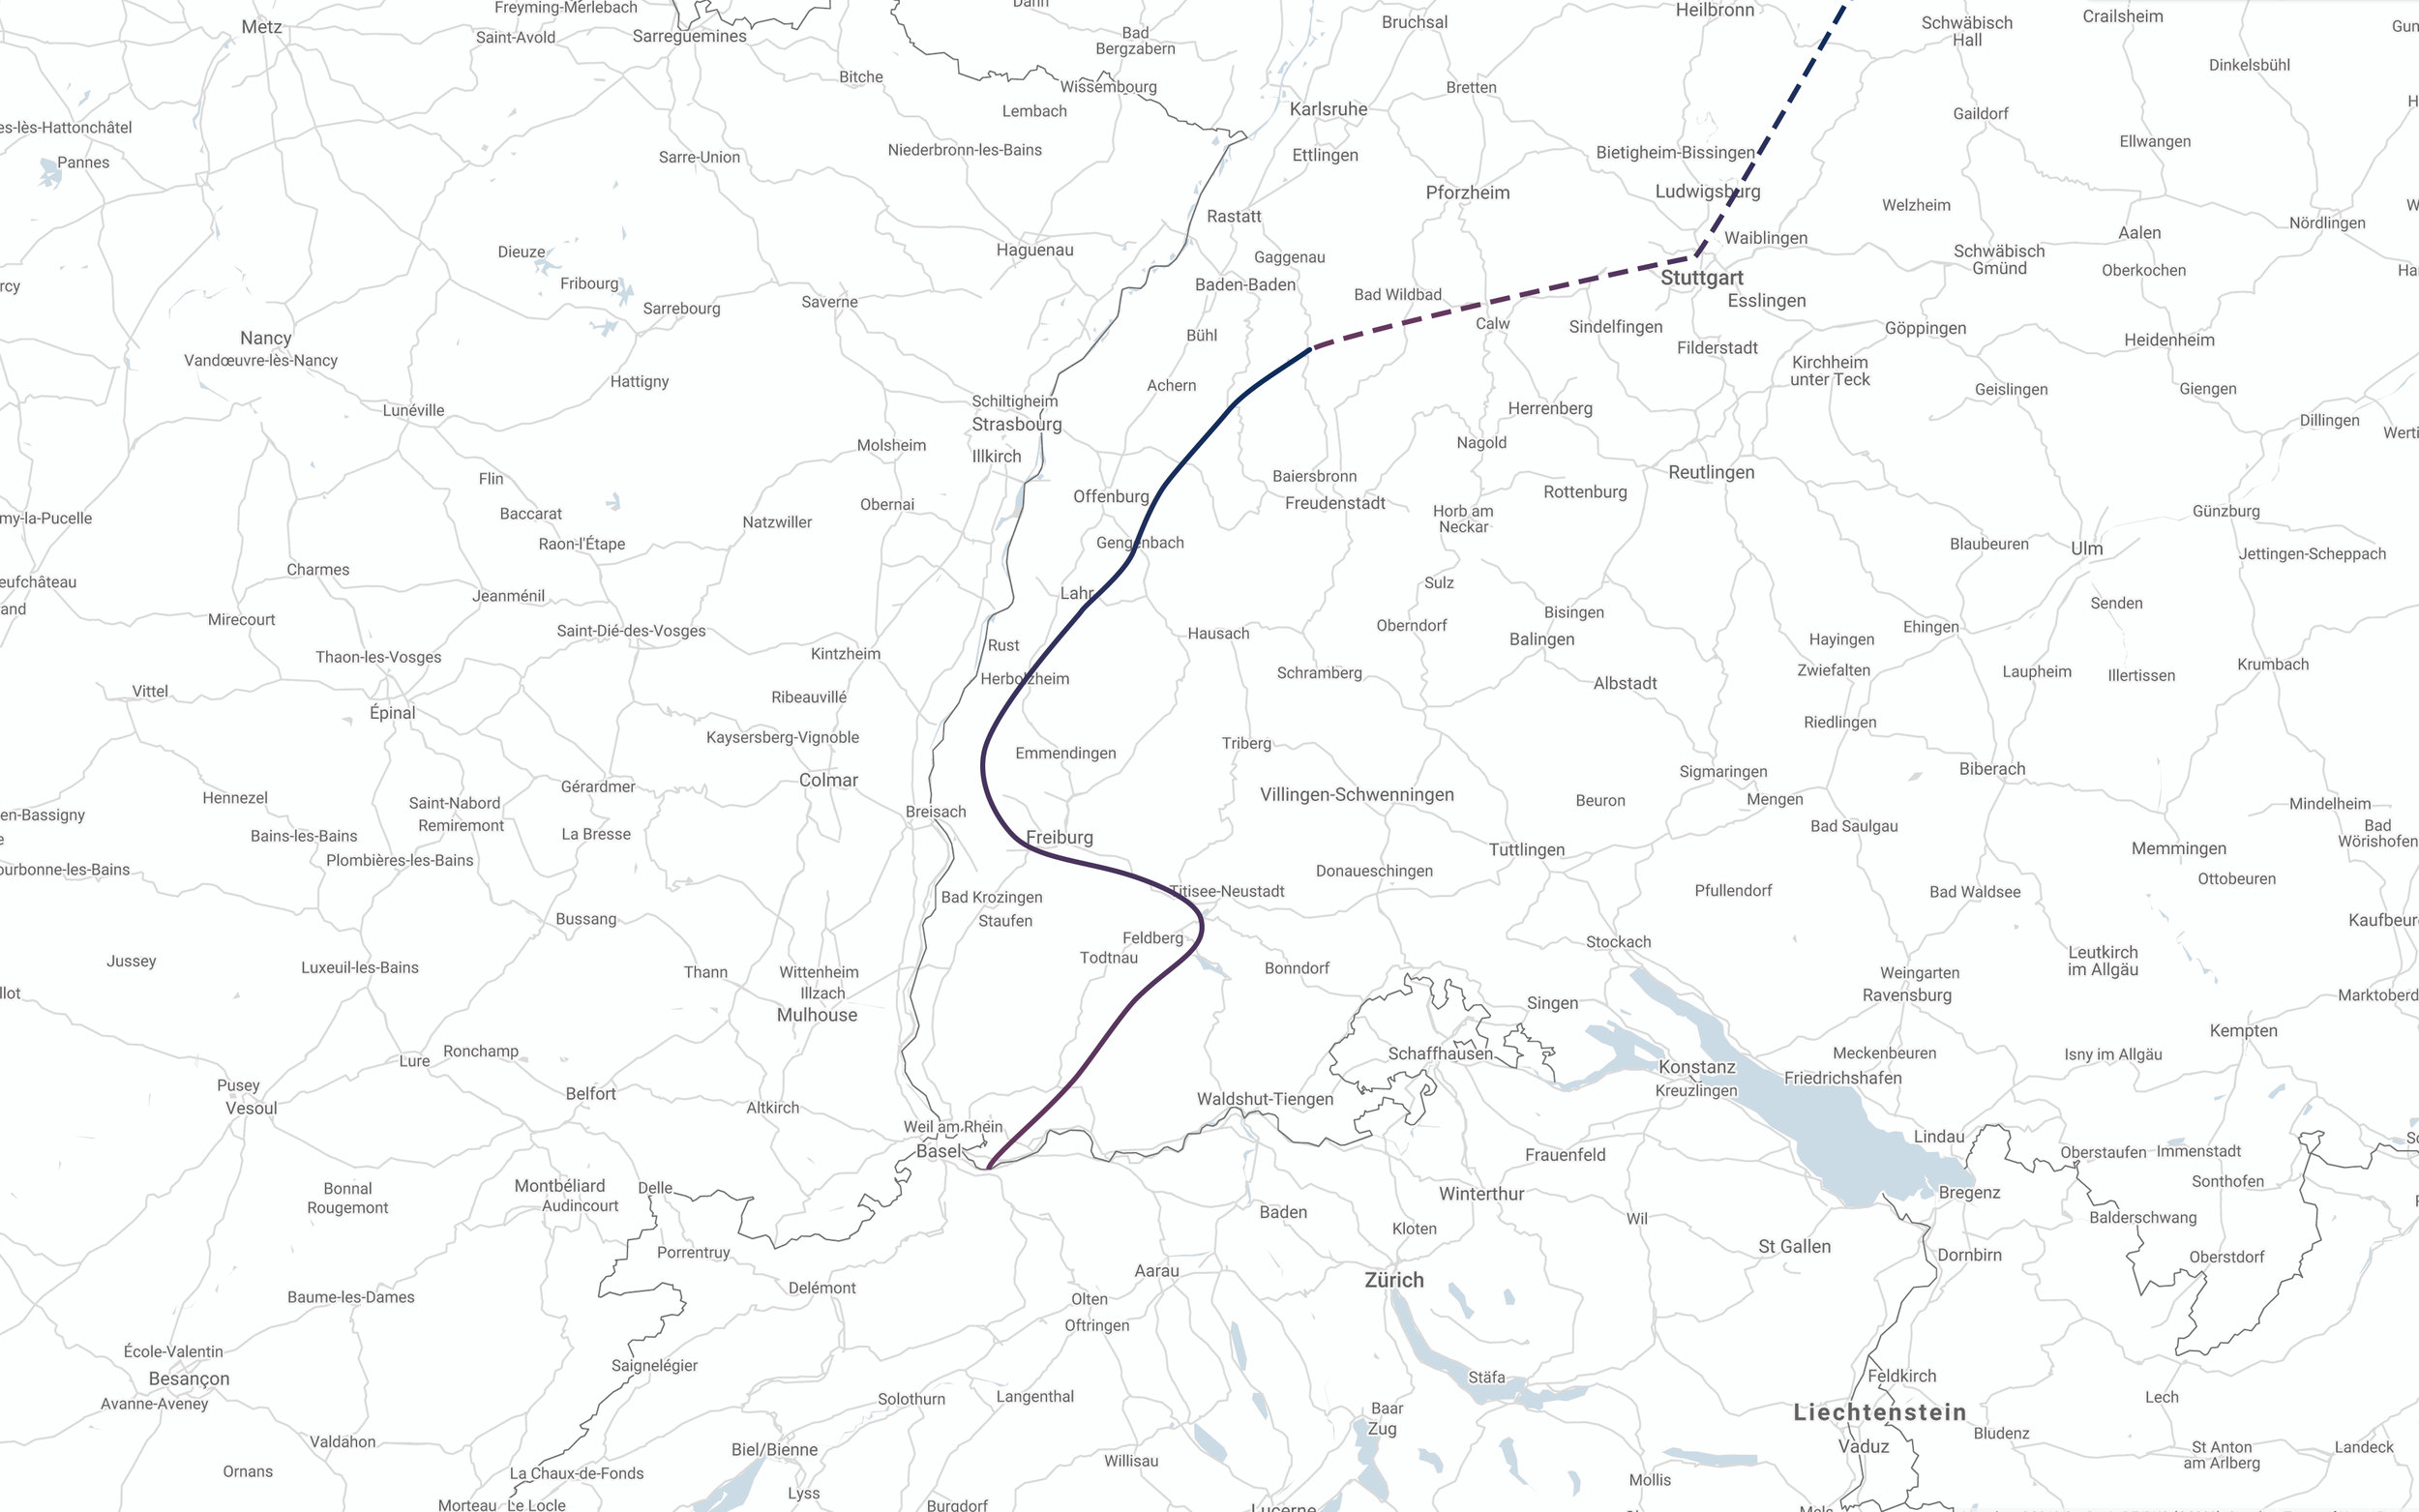 4 The Slow Race Map Germany.jpg